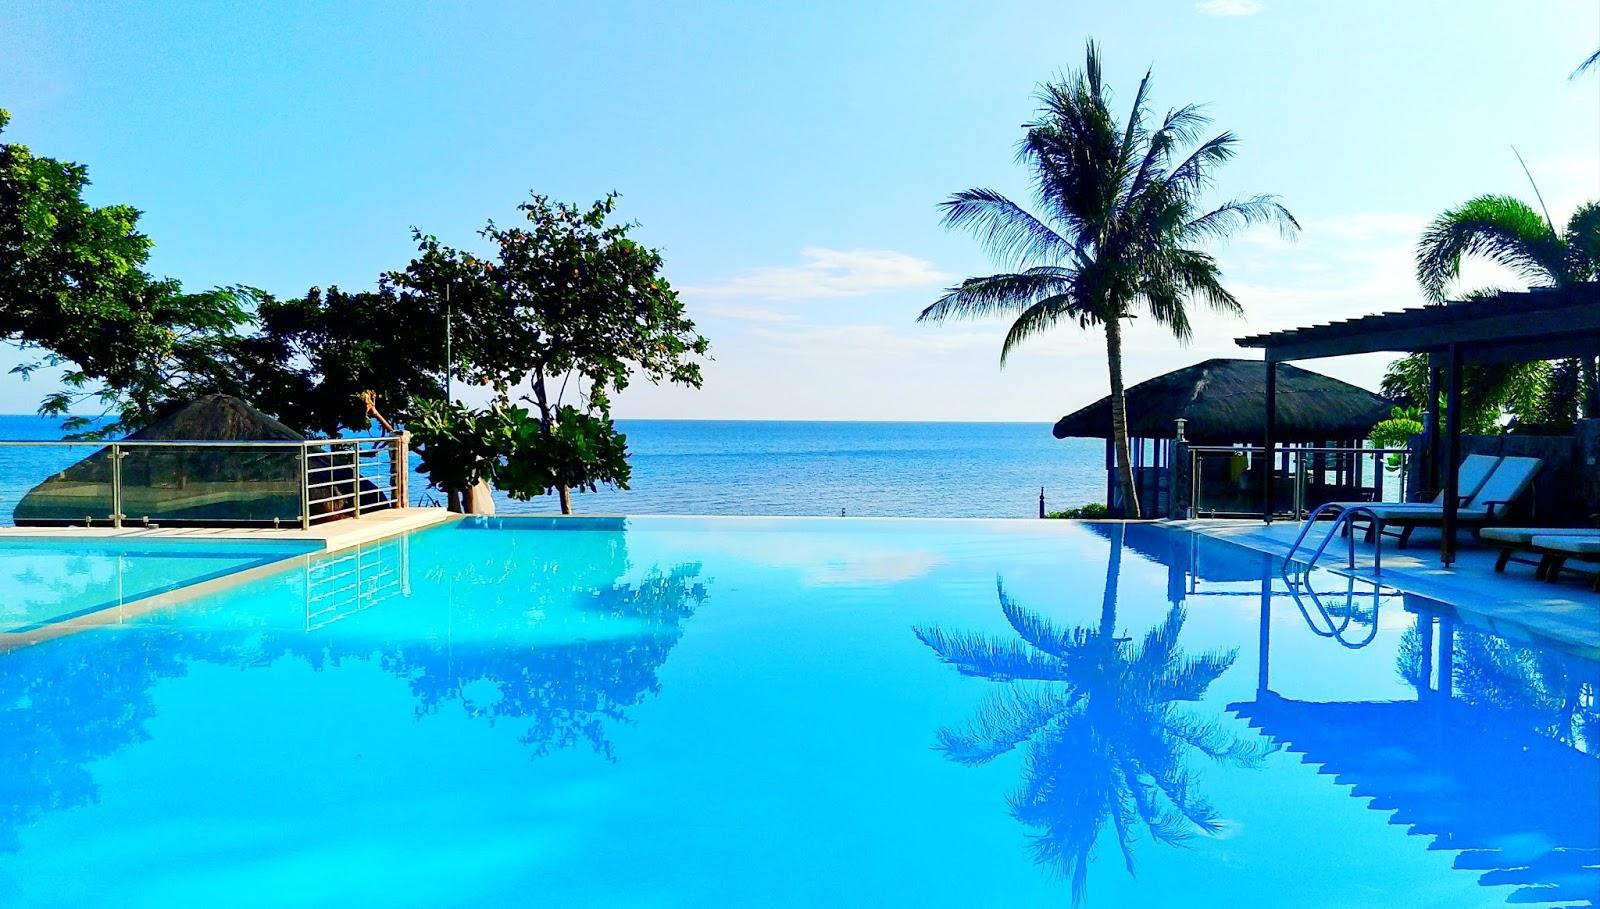 Palm Beach Resort in Laiya Batangas - The Pinoy Traveler